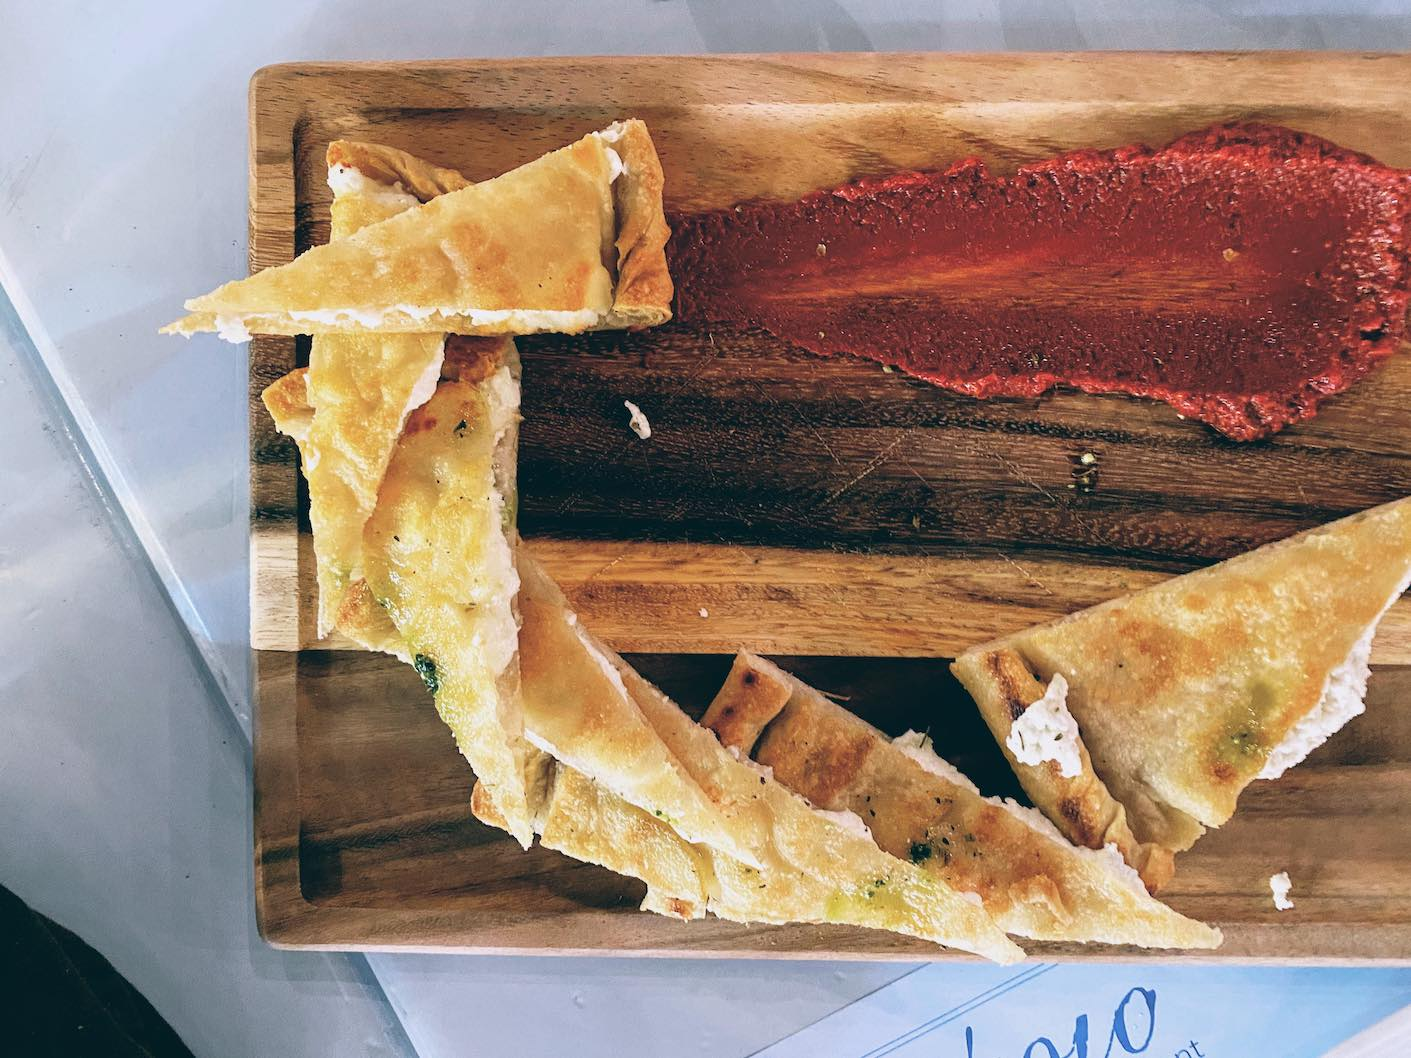 Mario, Paros - Travel Food People